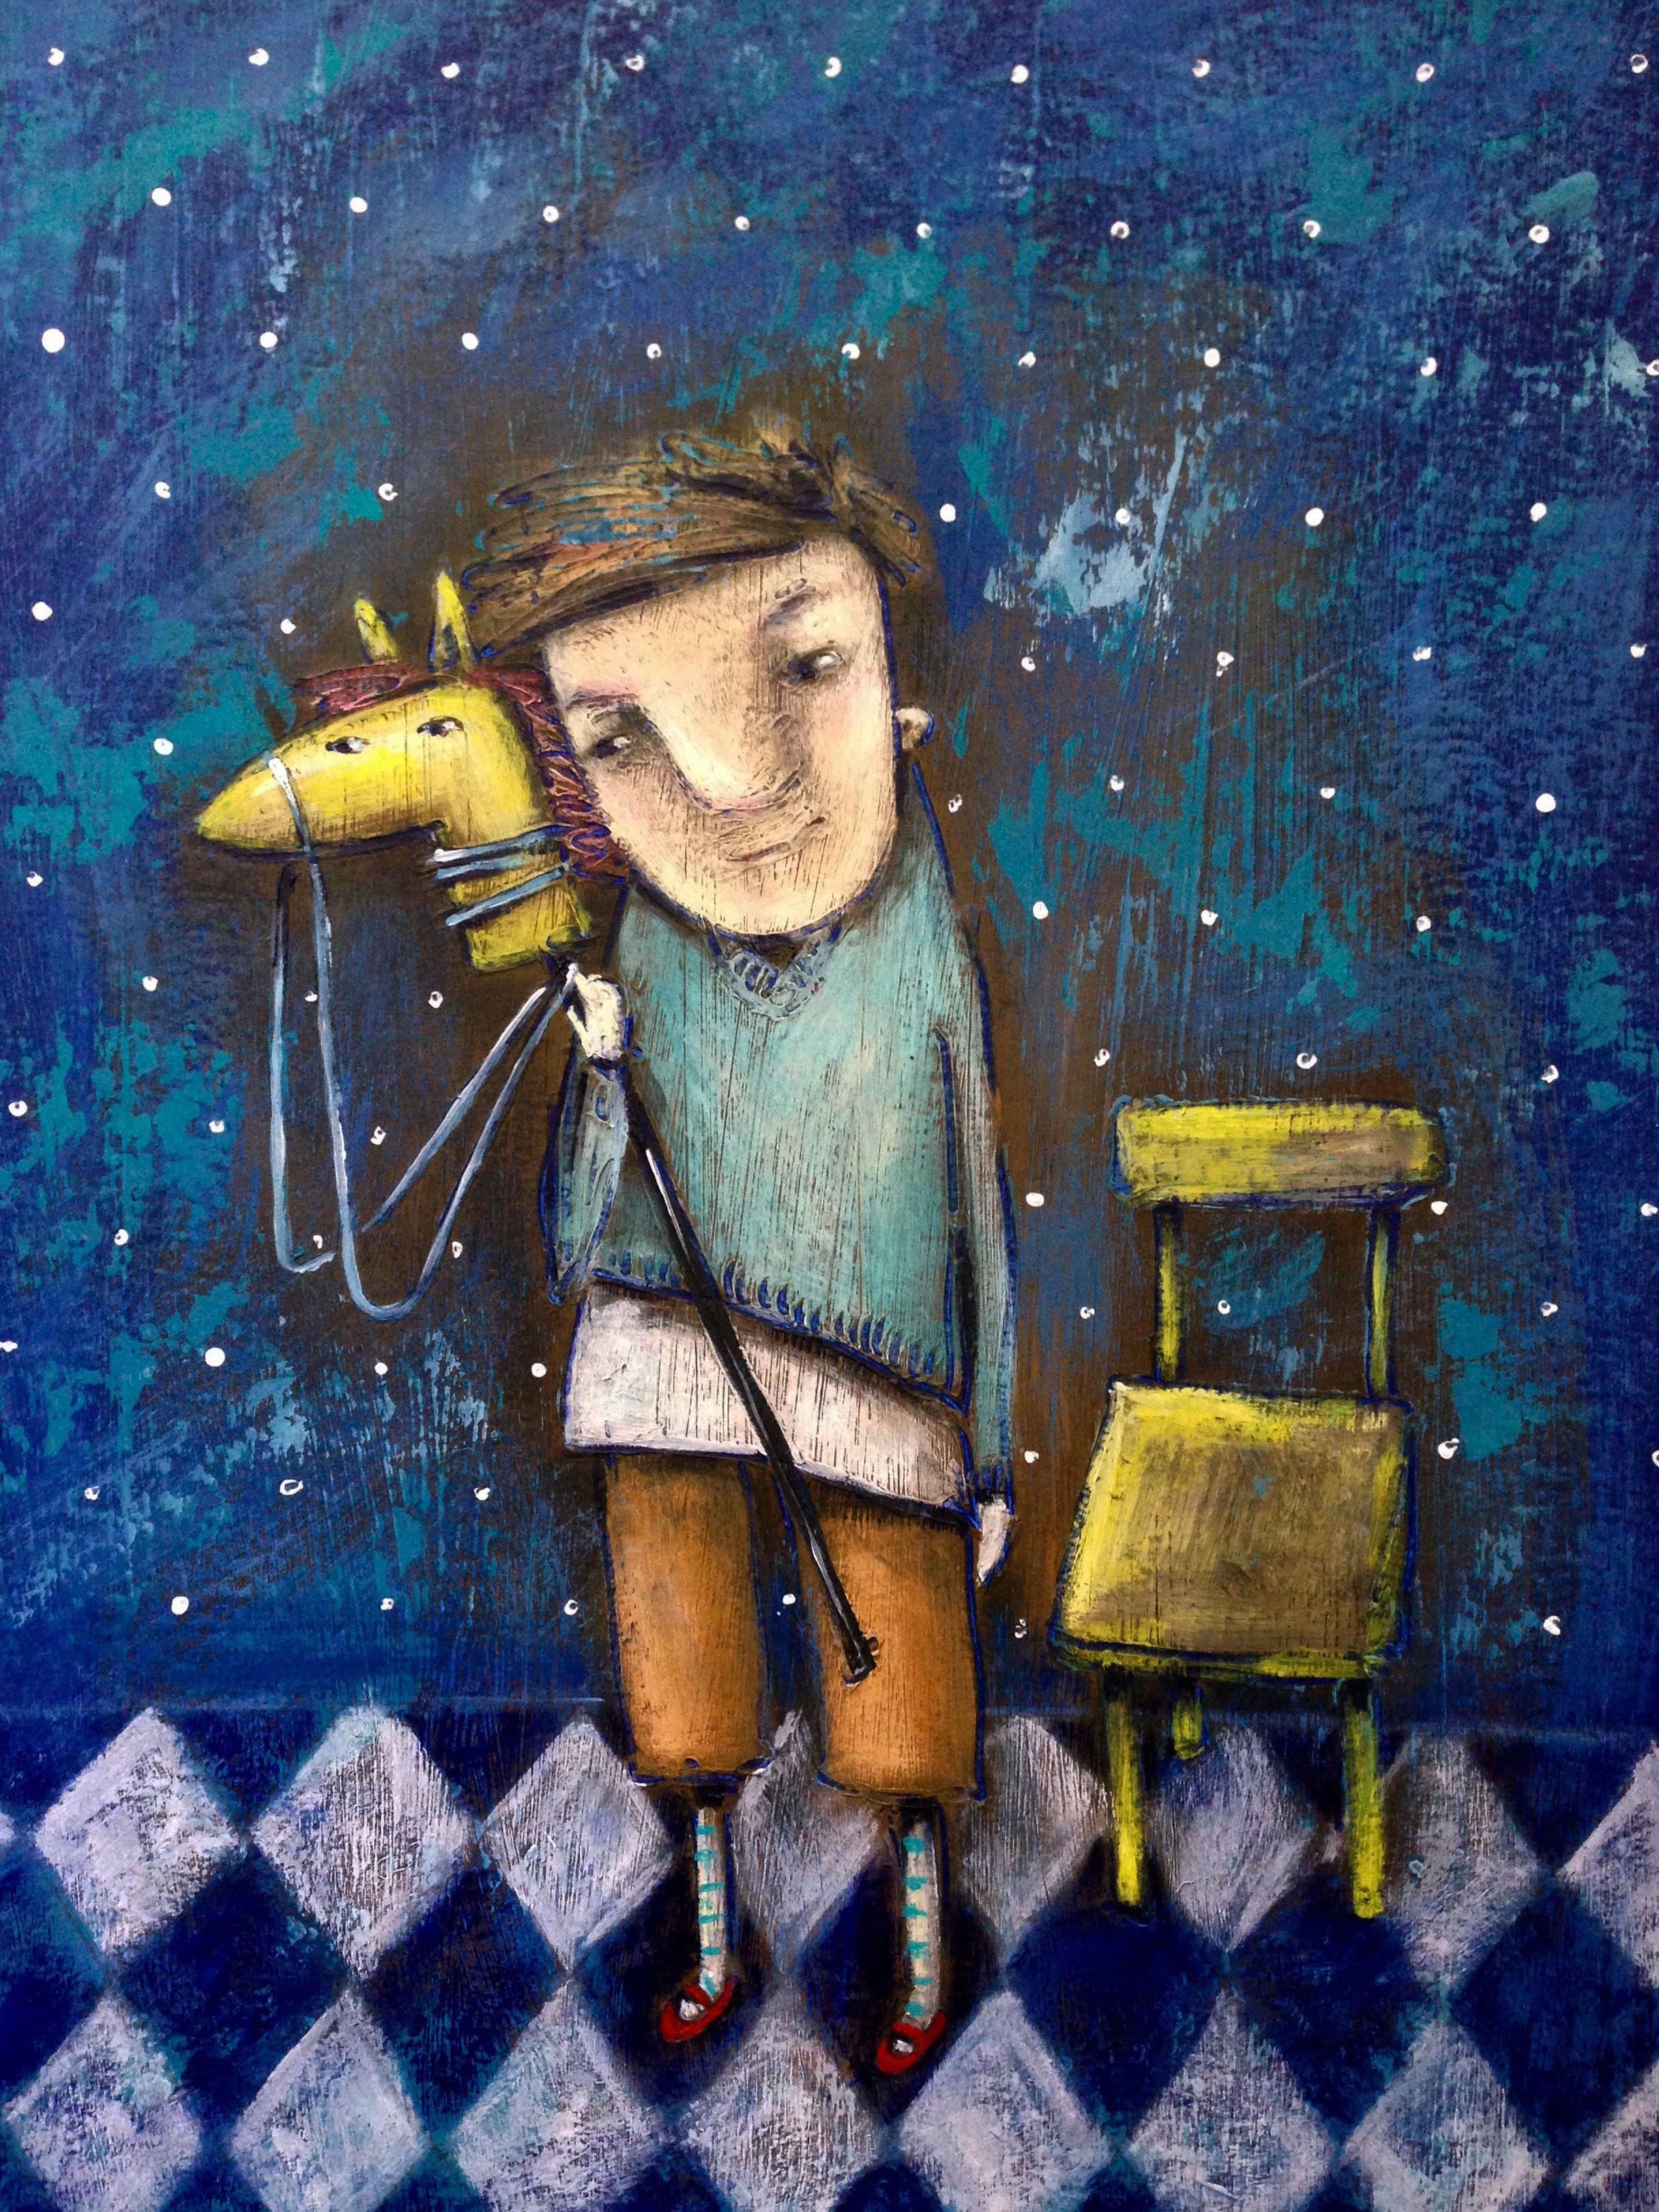 Воспоминание о детстве (With images) | Painting, Art, Art ...